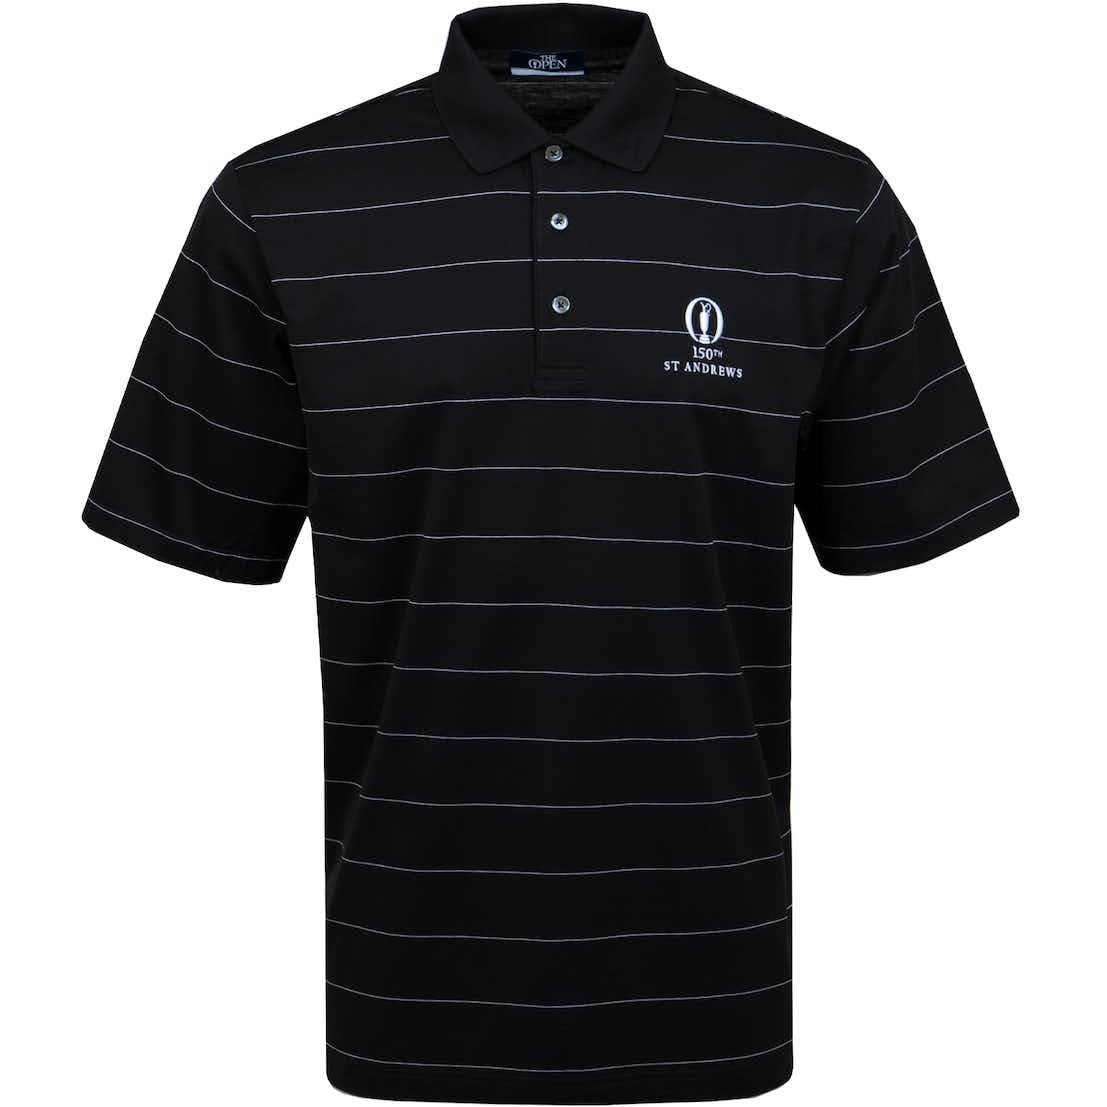 150th St Andrews Striped Polo Shirt - Black